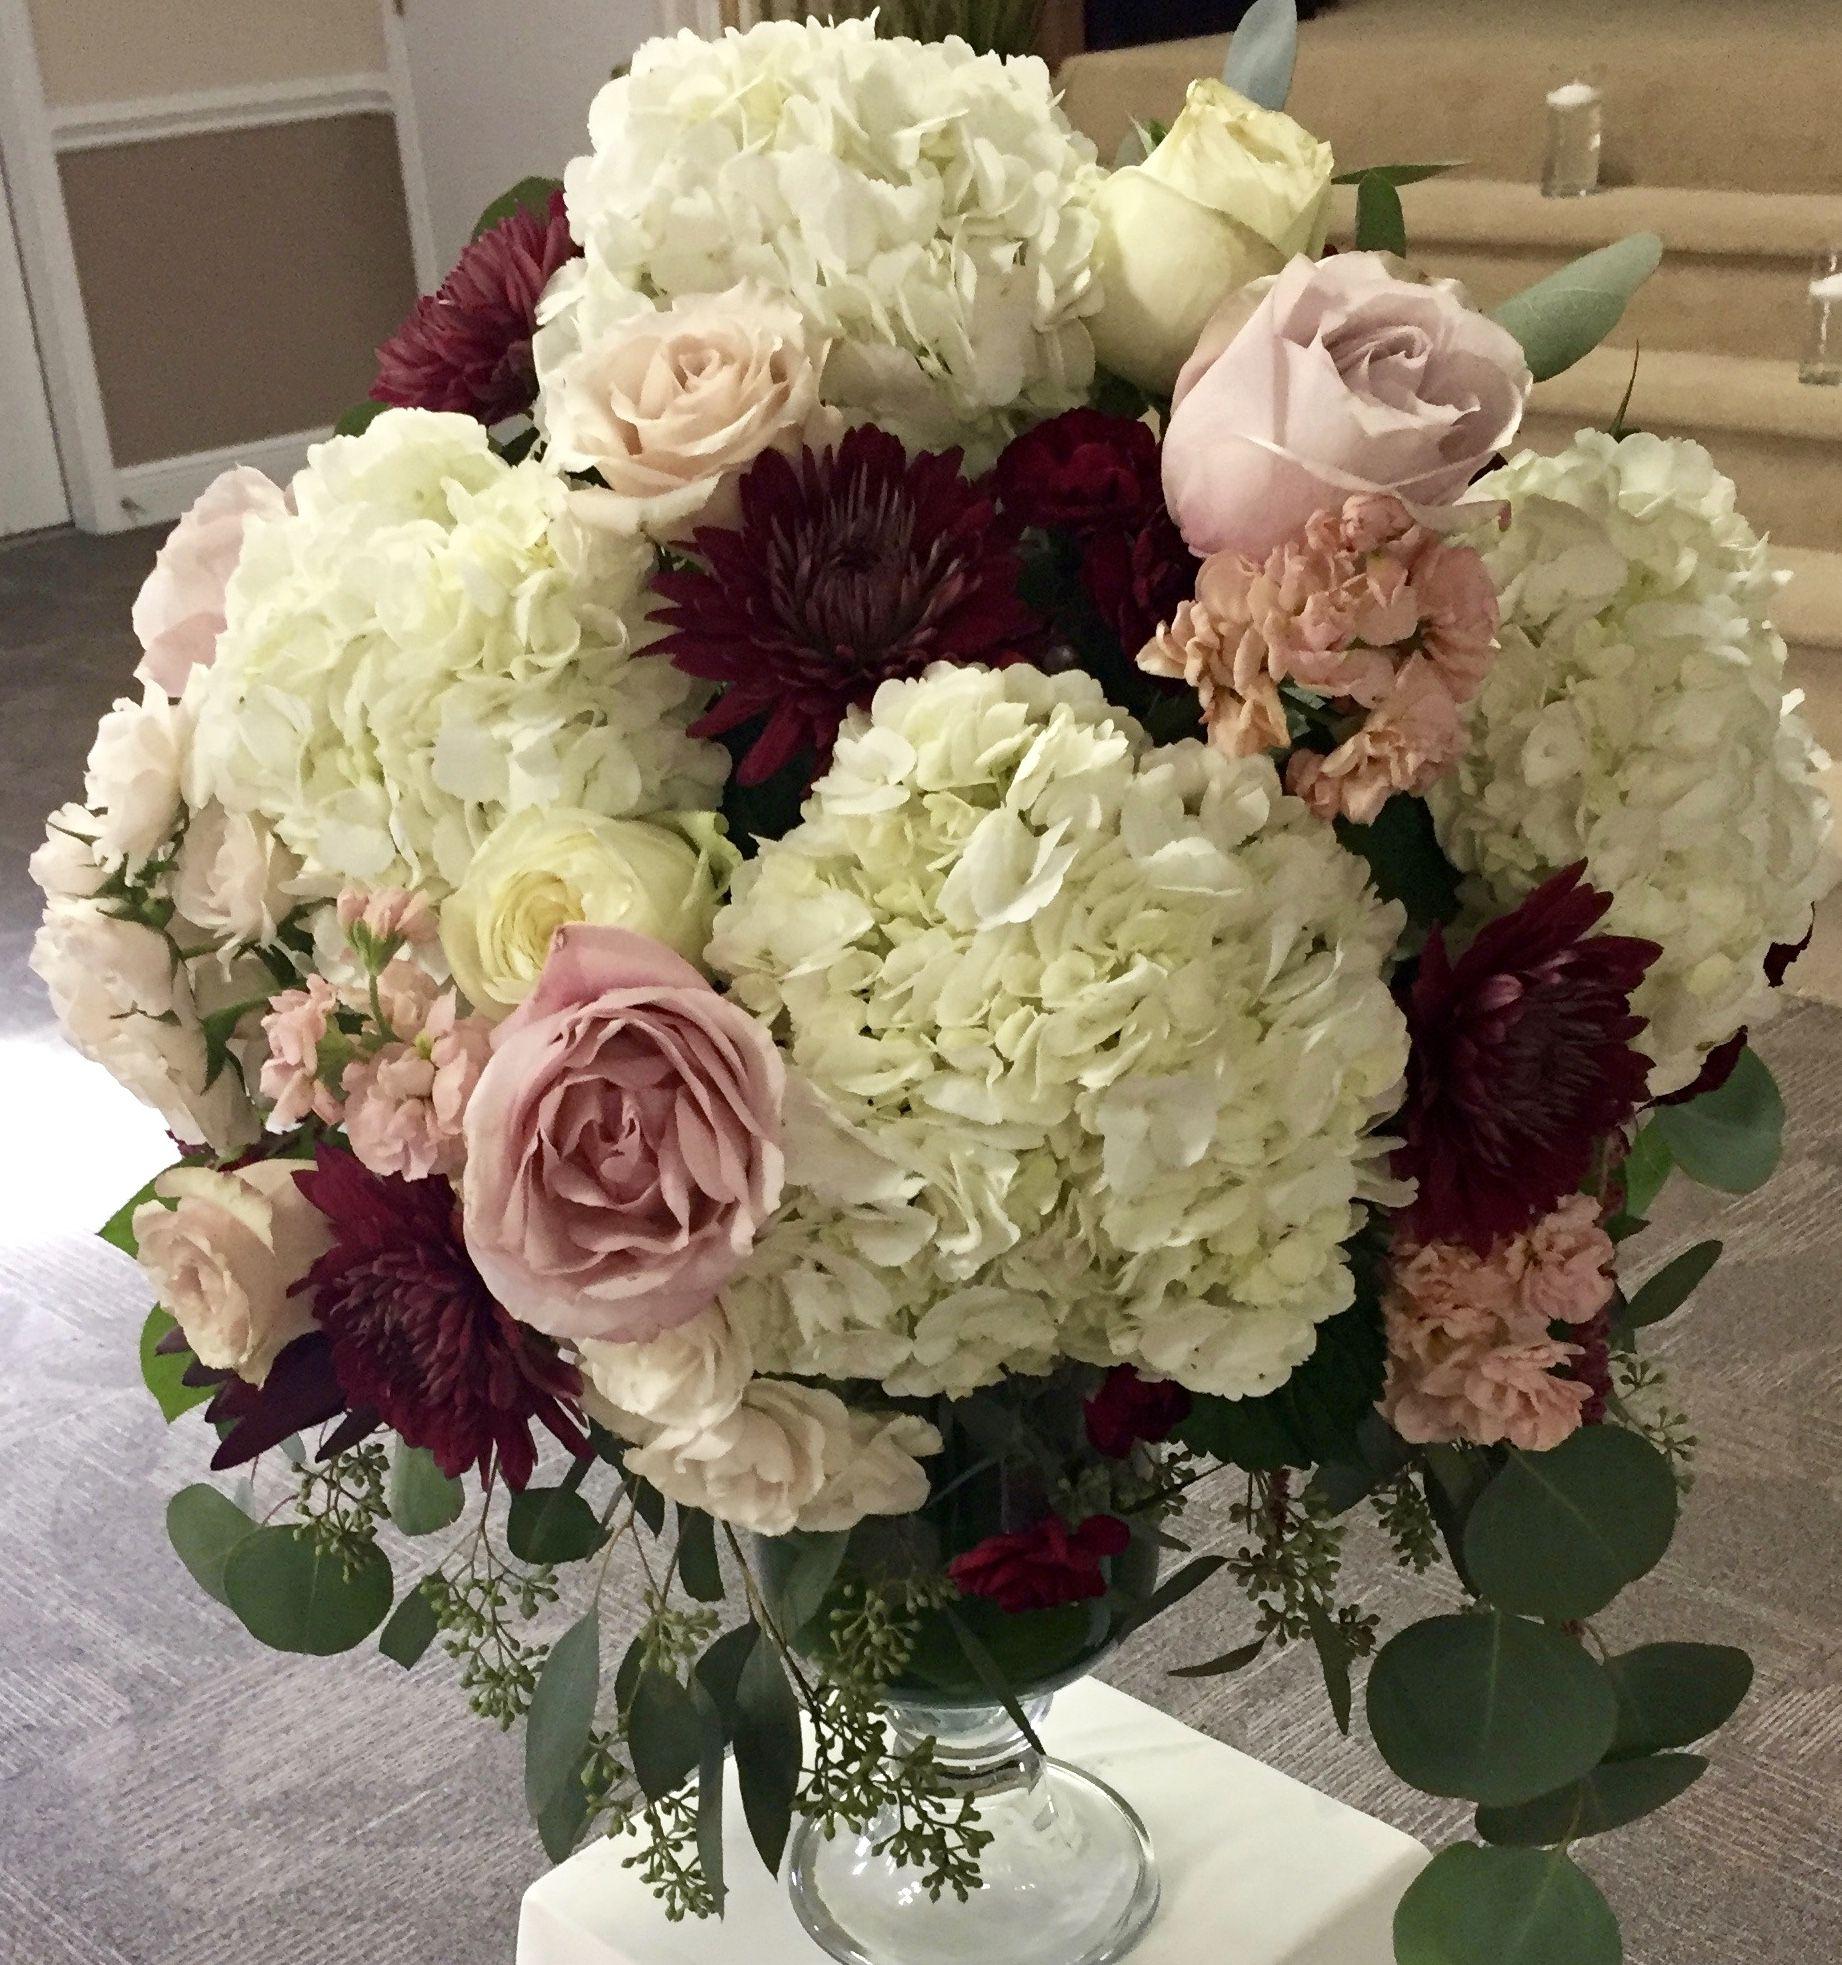 Wedding Altar Flowers With Eucalyptus: White Hydrangea, Burgundy Mums, Pink Stock, Quicksand